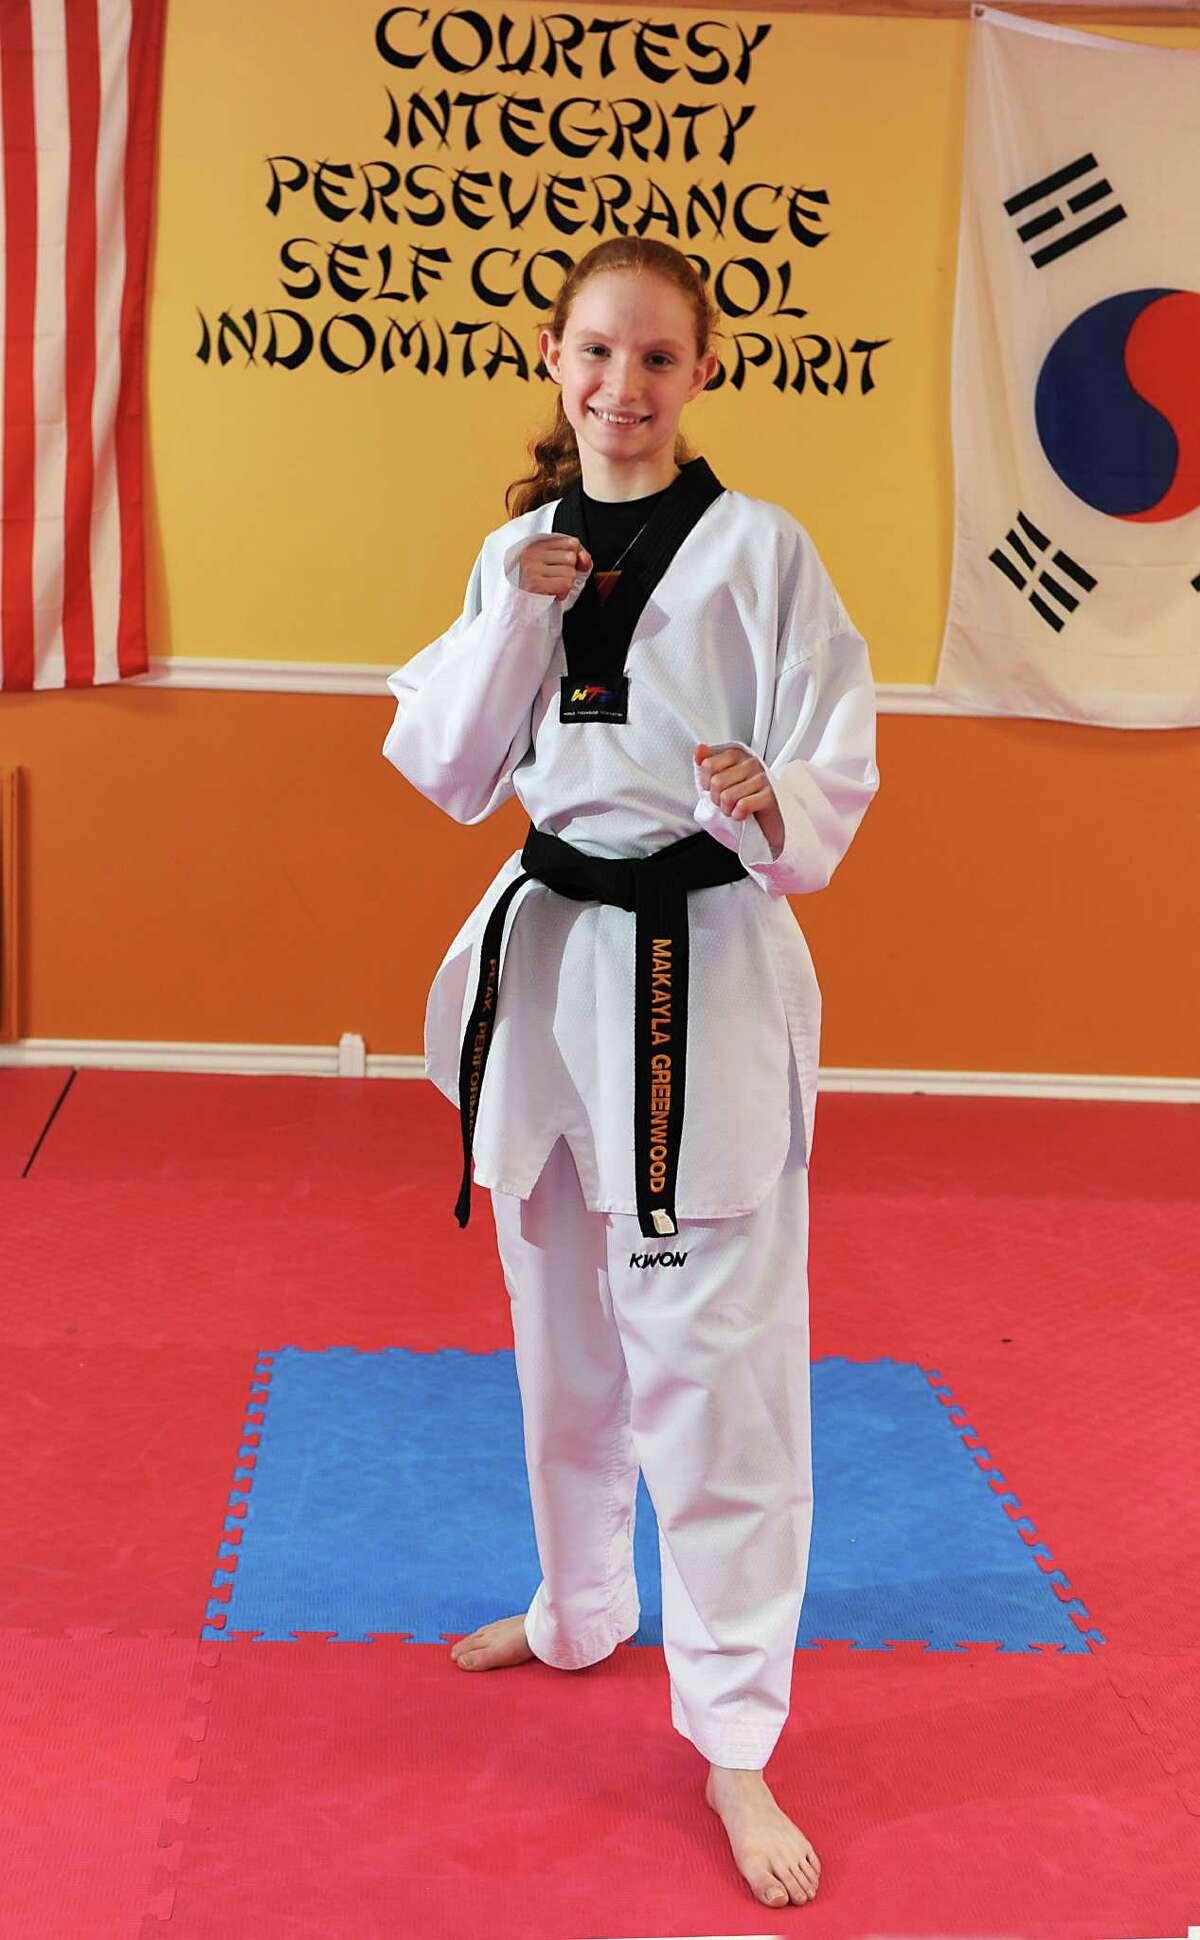 Taekwondo competitor Makayla Greenwood, 12, of Schenectady stands in Peak Performance where she trains Wednesday, Feb. 10, 2016 in Glenville, N.Y. Makayla recently took Gold at the 25th US International Taekwondo Open in Reno, Neveda. (Lori Van Buren / Times Union)